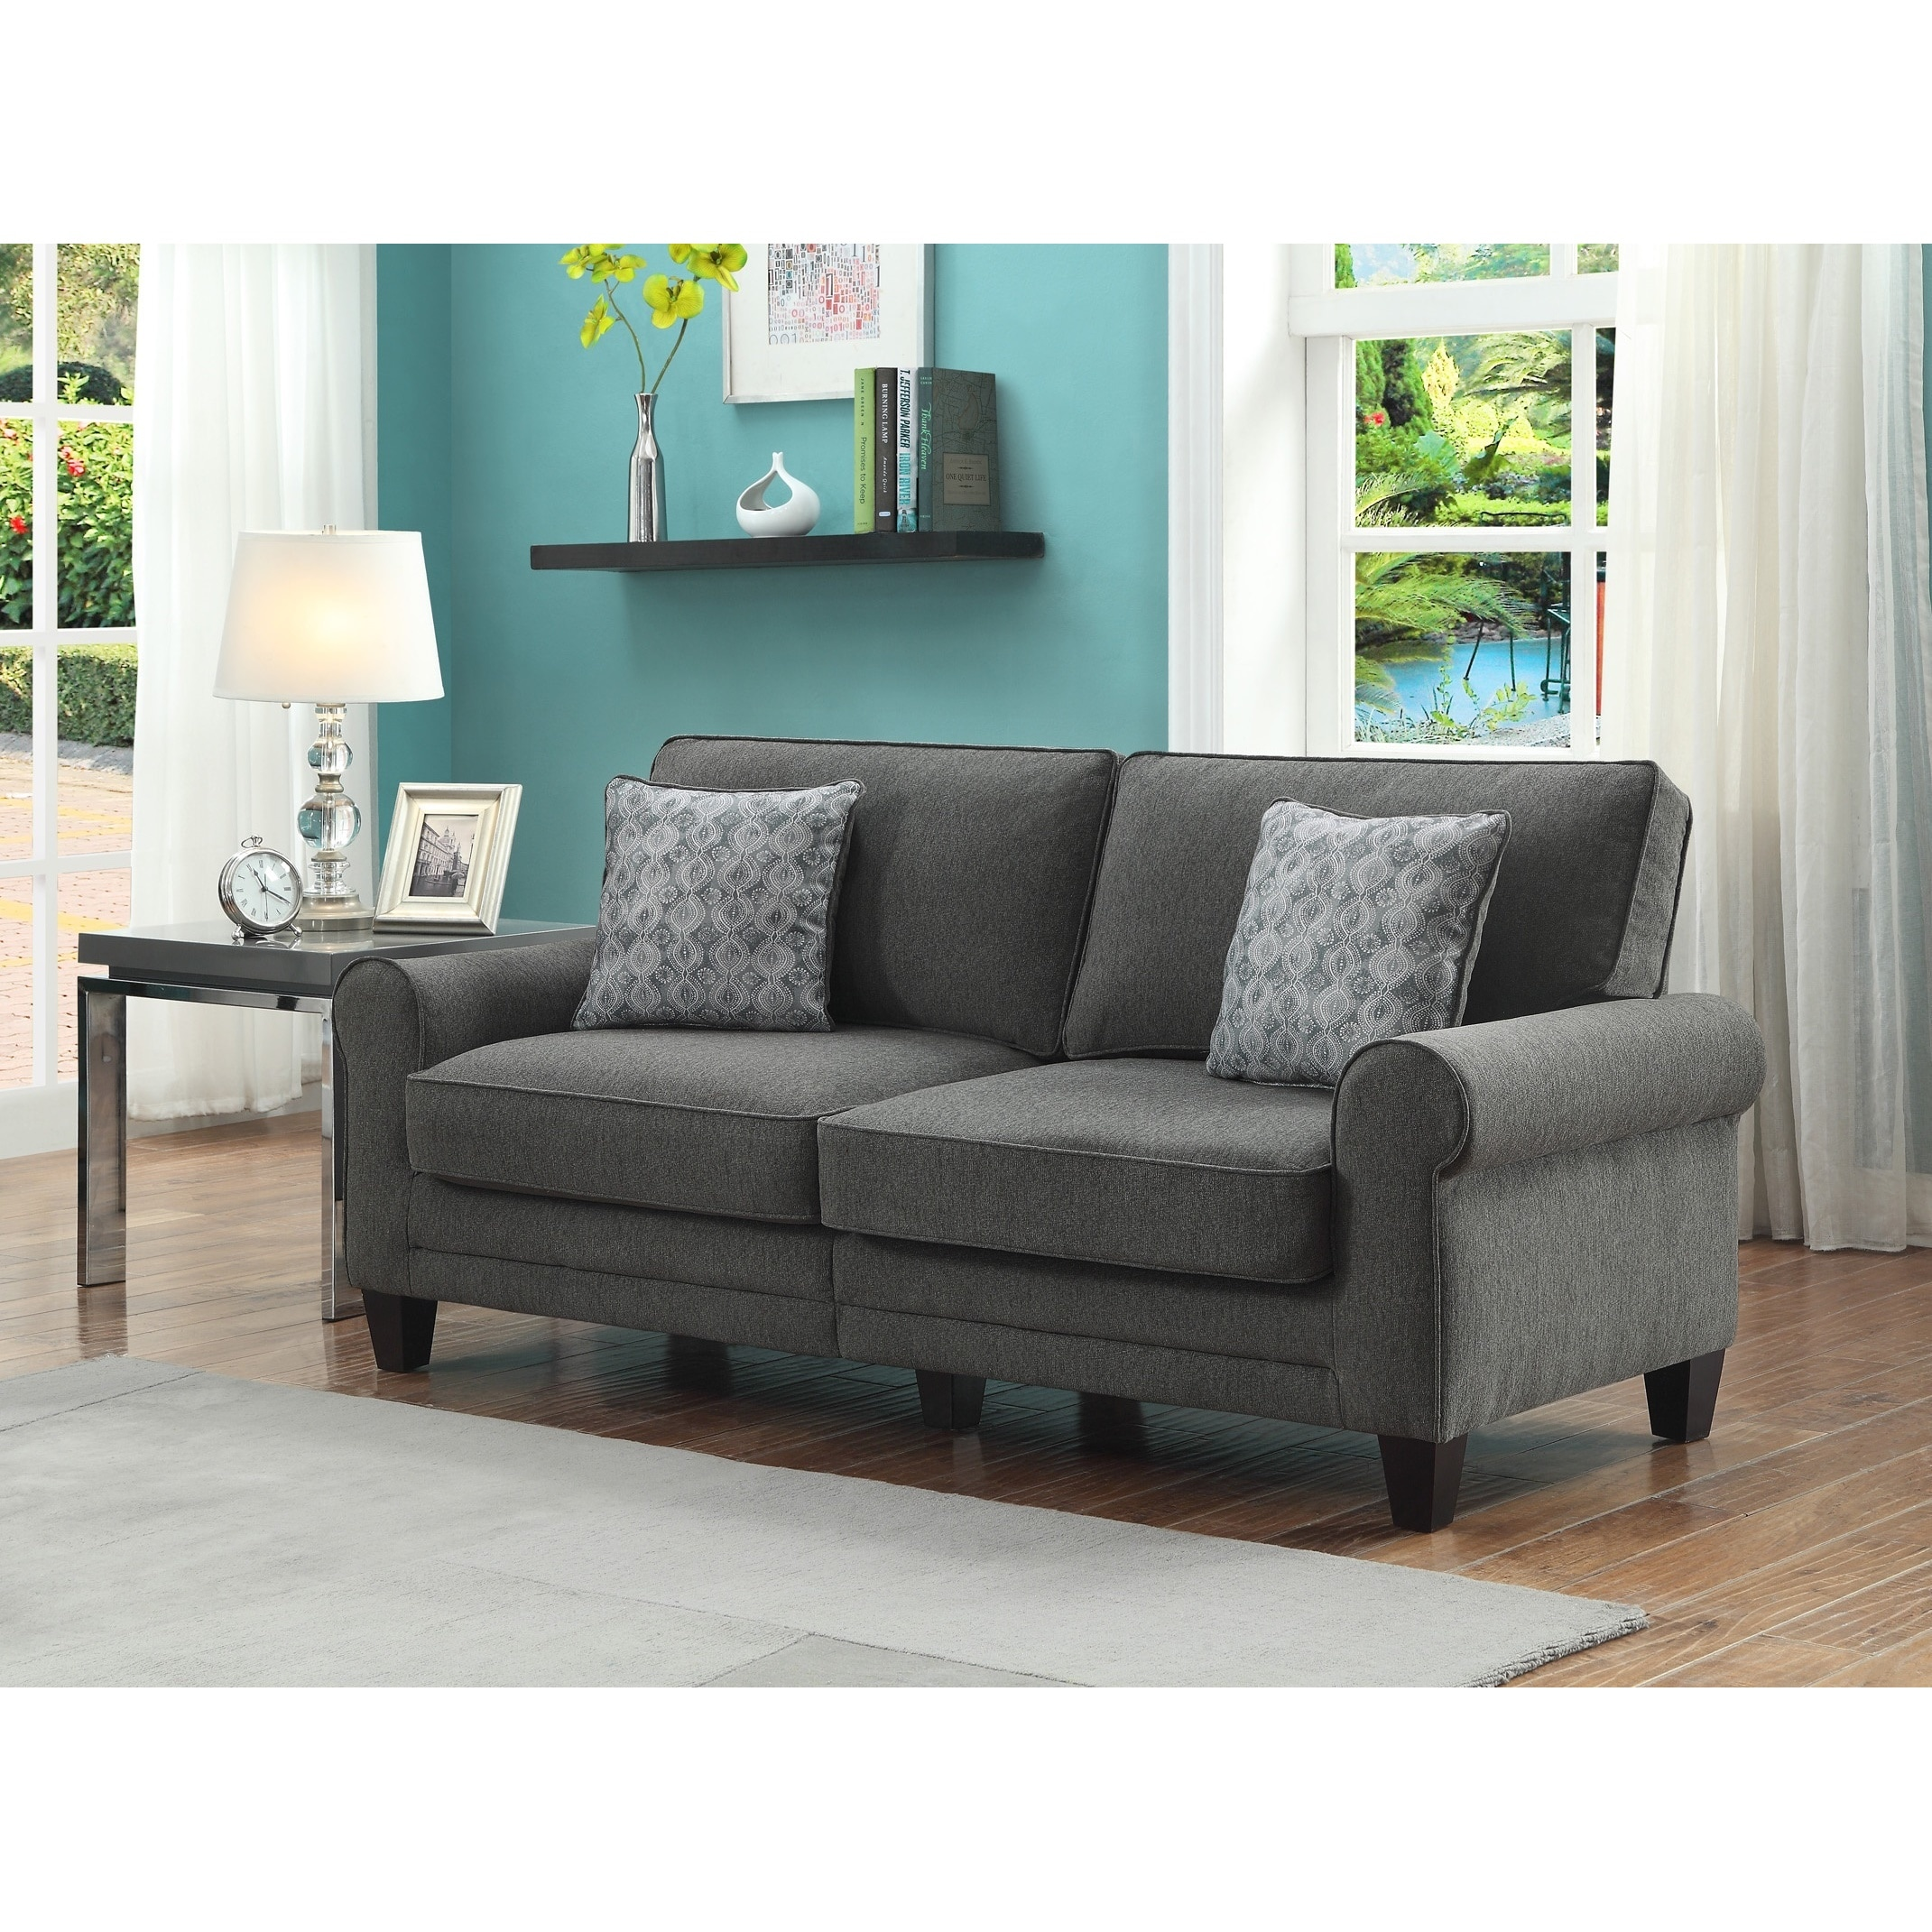 Somerset sofa fantastic furniture for Sofa bed yeovil